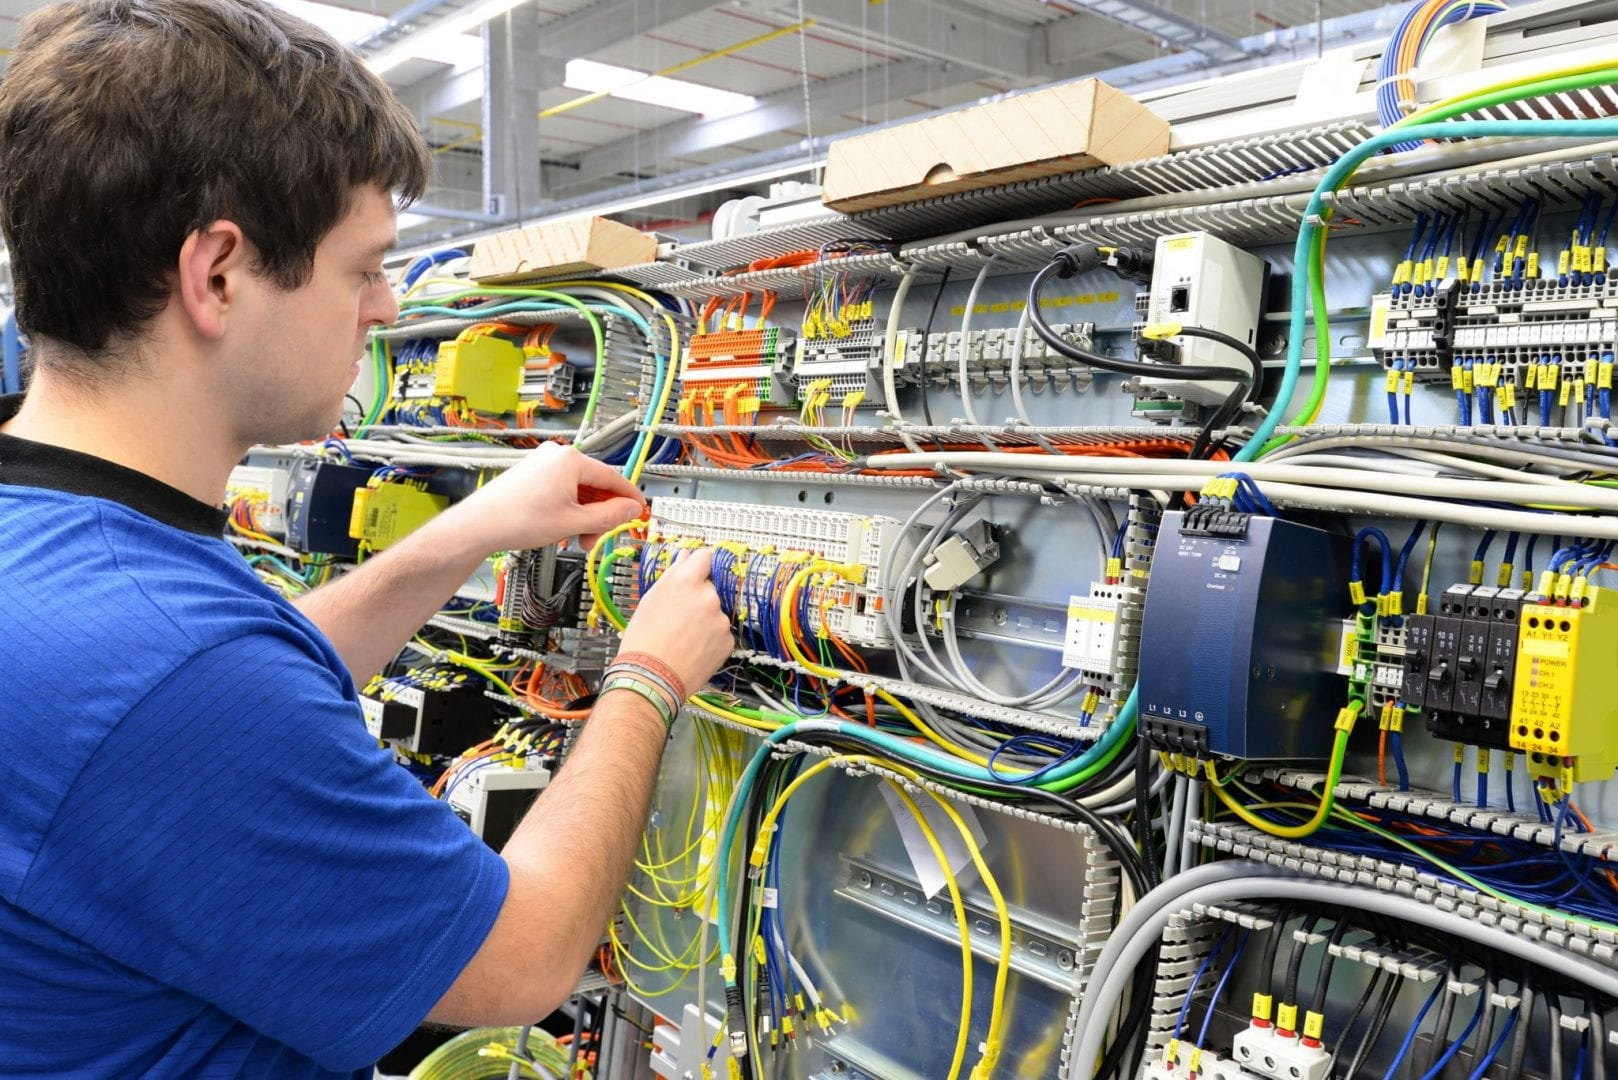 Elektroniker im Maschinenbau montiert Schaltschrank in einer Fabrik // workers mounted electronics in a factory